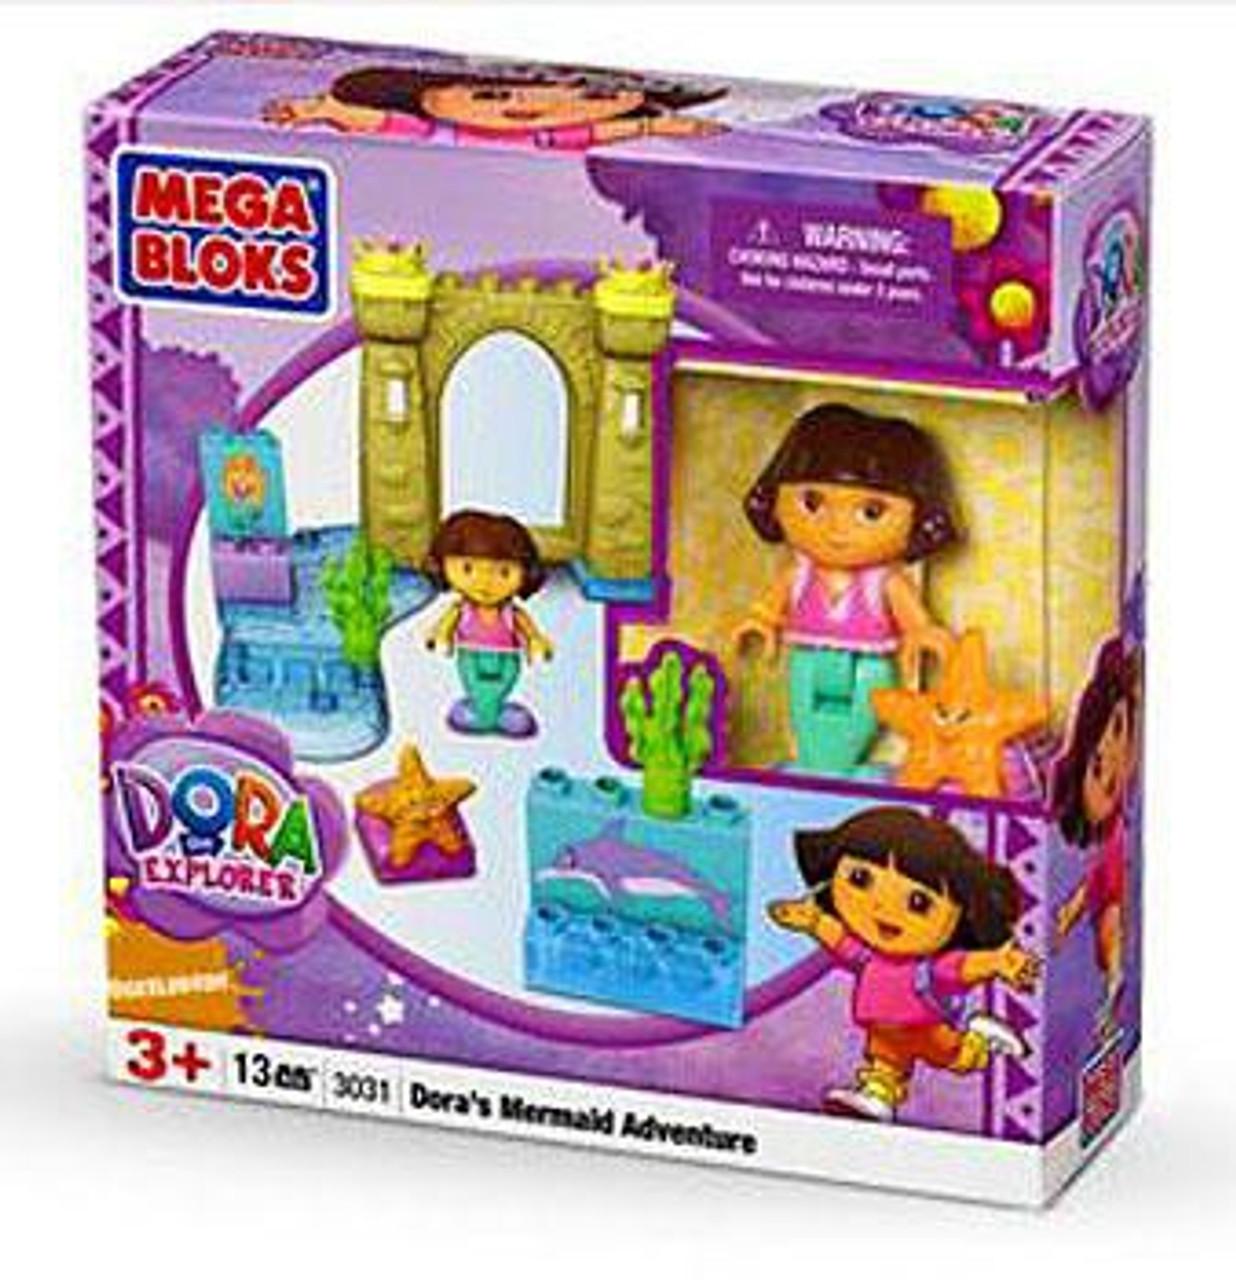 Mega Bloks Dora the Explorer Dora's Mermaid Adventure Set #3031